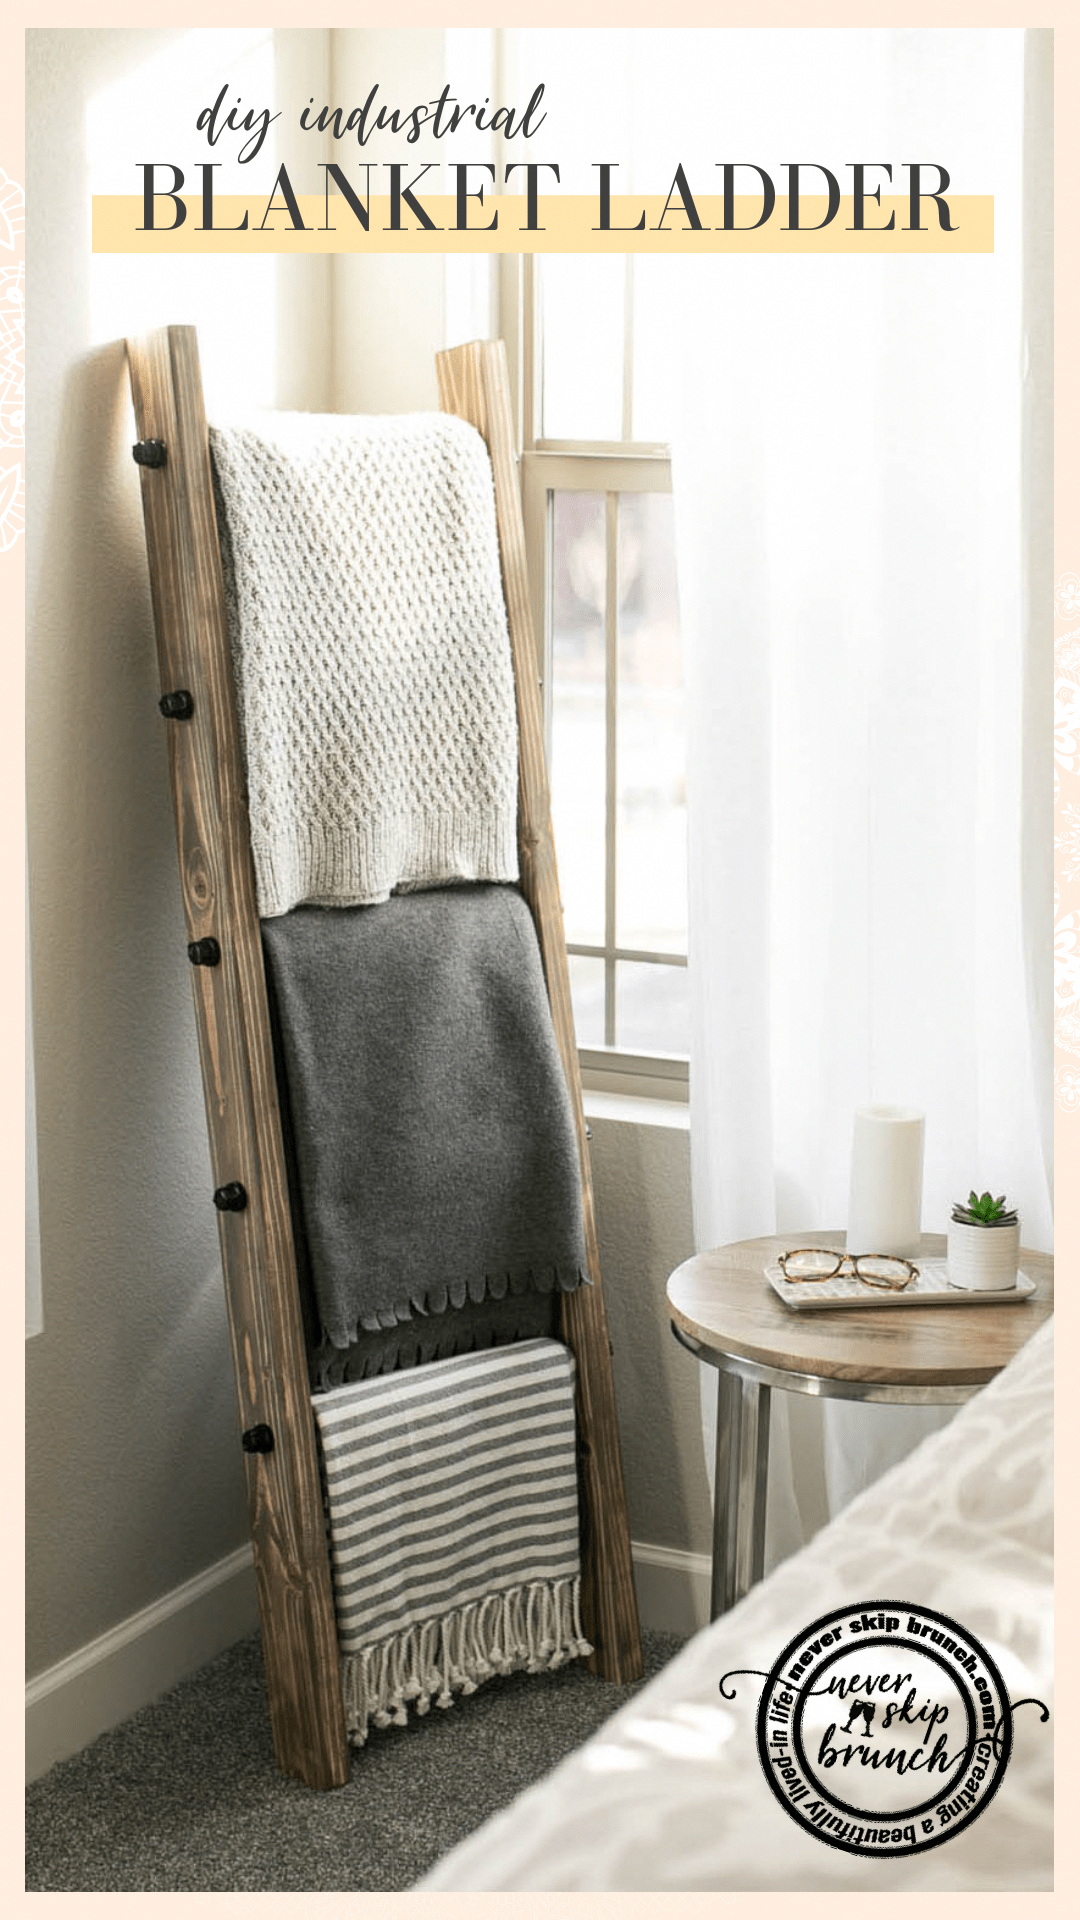 Photo of How to make a DIY Industrial Style Blanket Ladder under $60 » NEVER SKIP BRUNCH